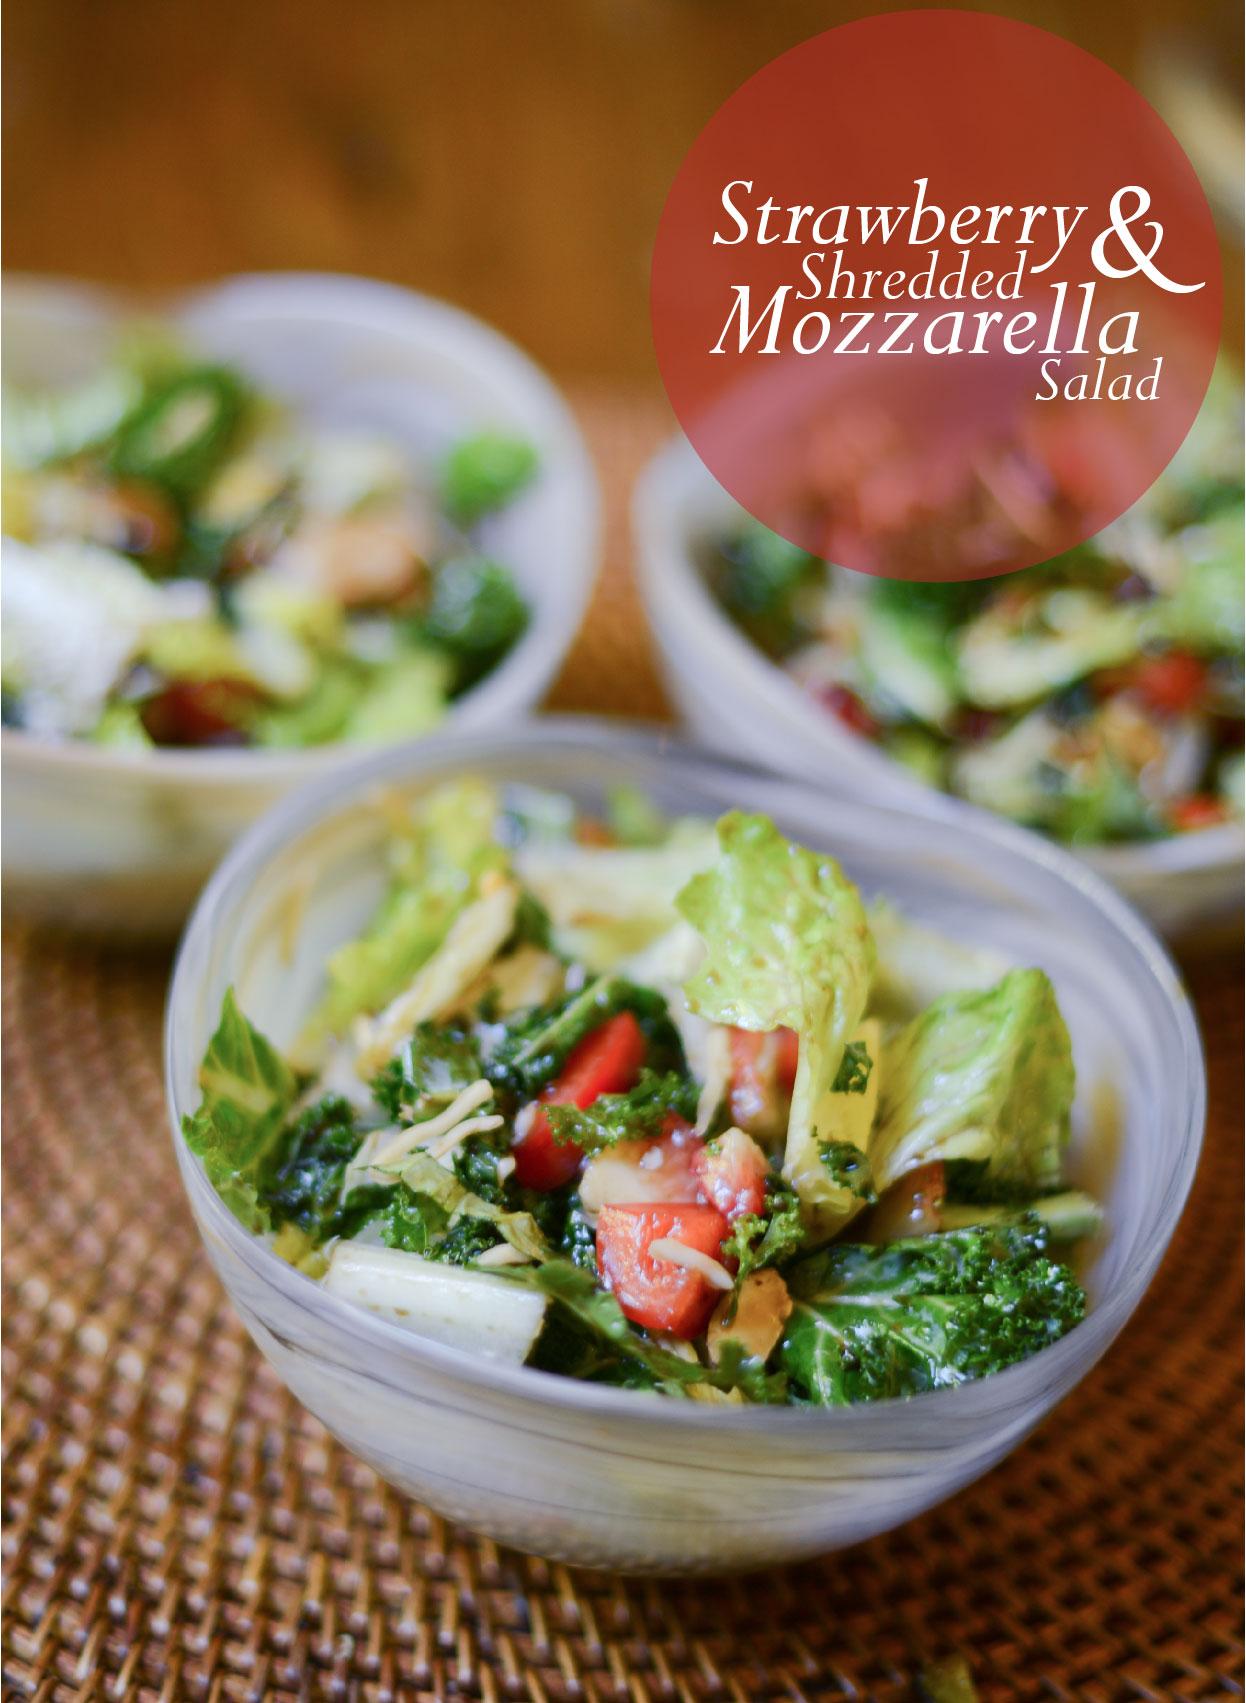 Strawberry & Mozzarella Salad by The Fashionable Hostess